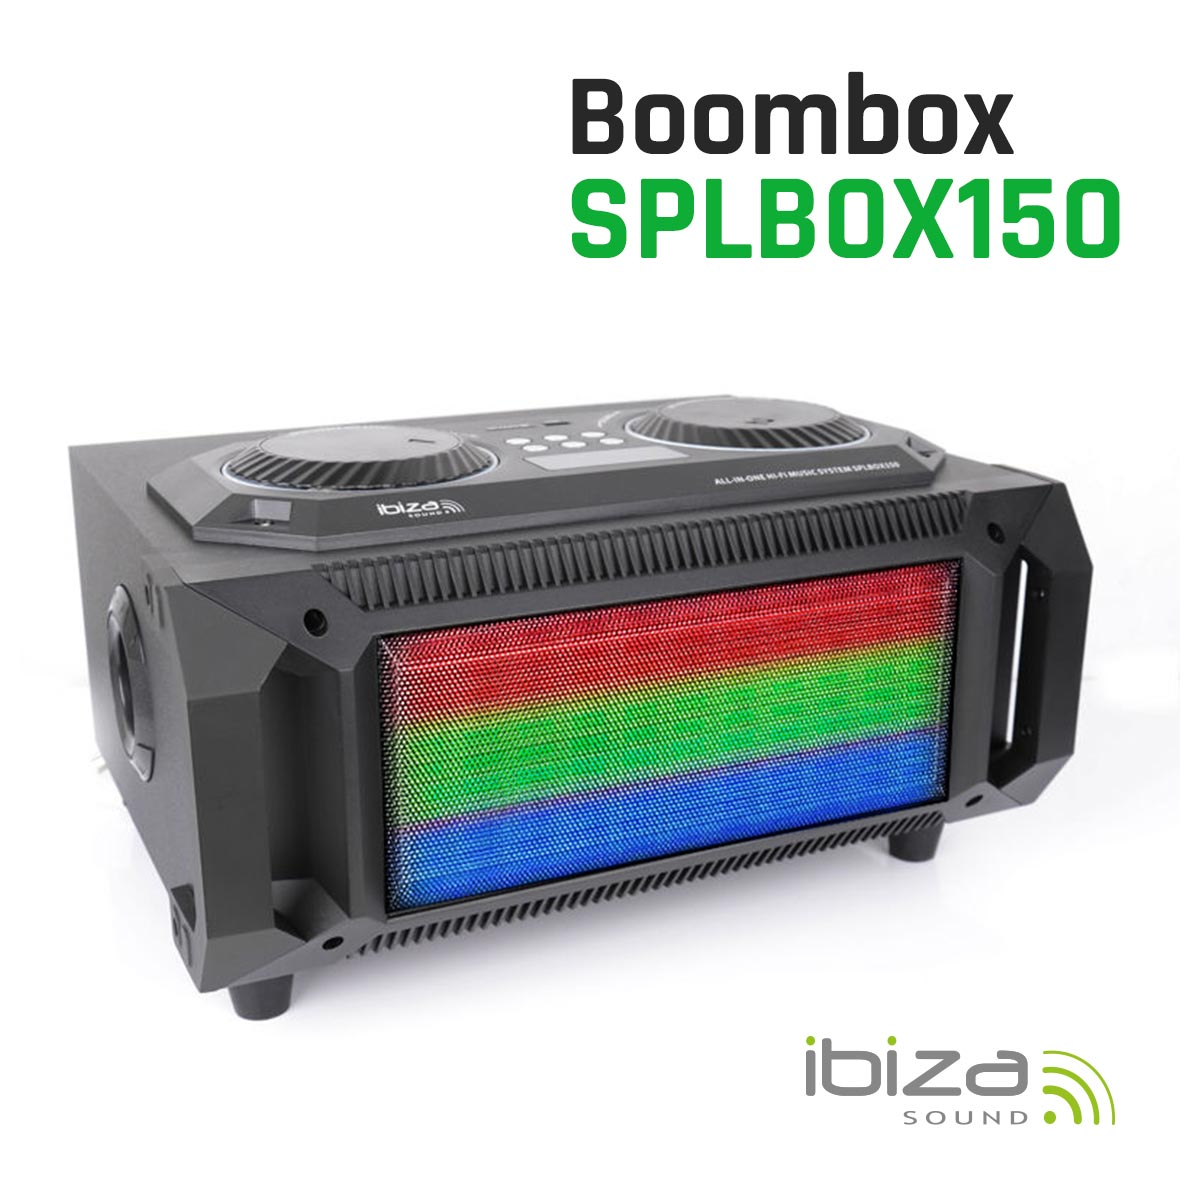 Boombox SPLBOX150